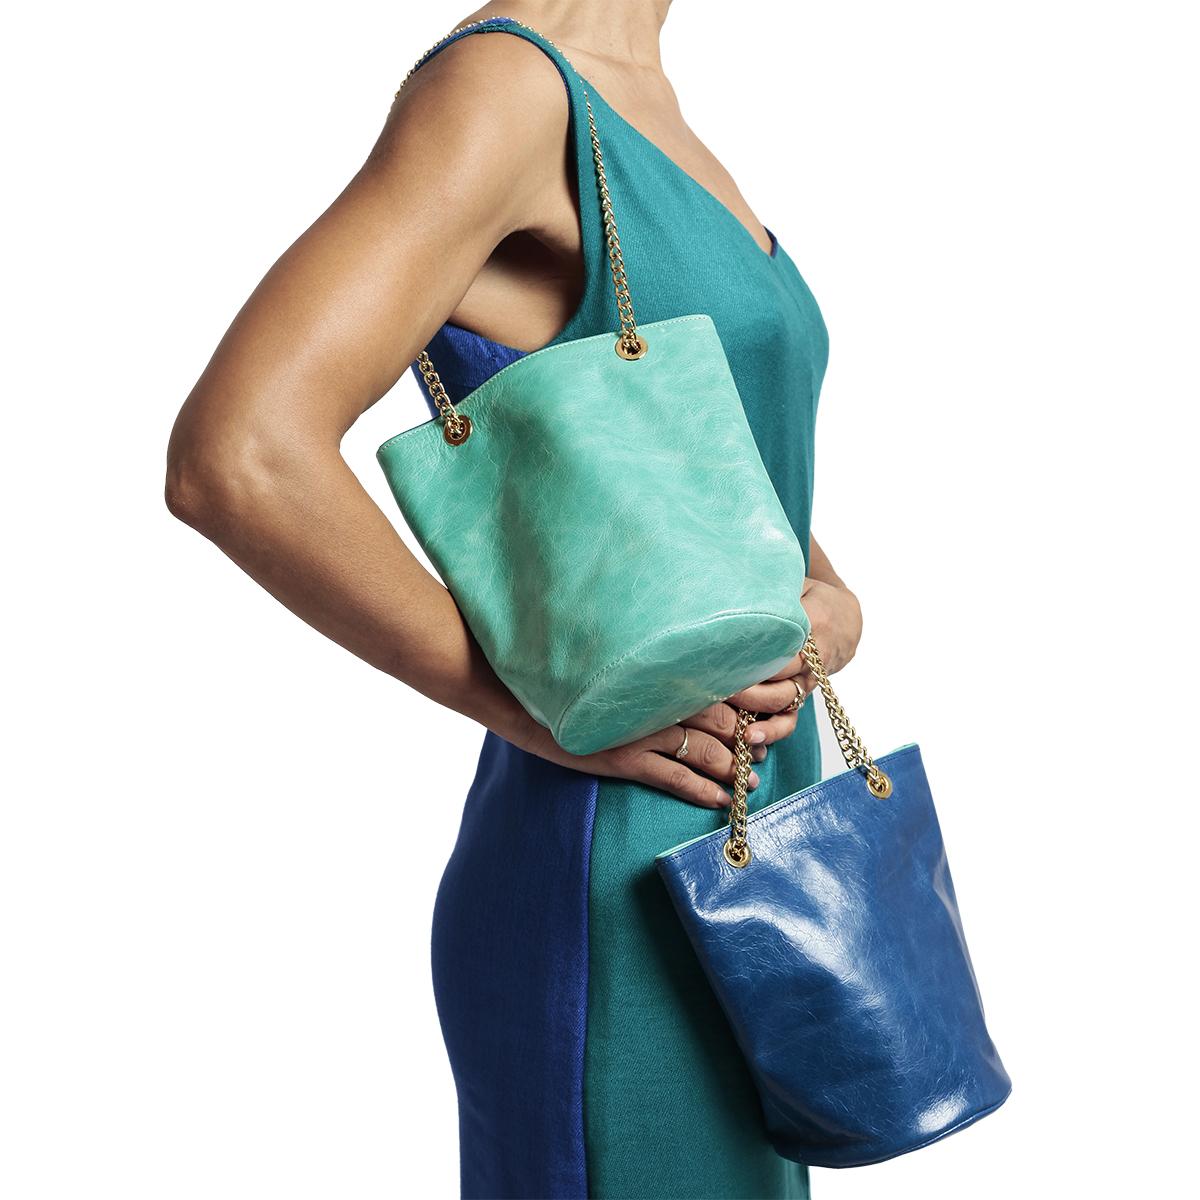 Sac seau réversible en cuir turquois/bleu